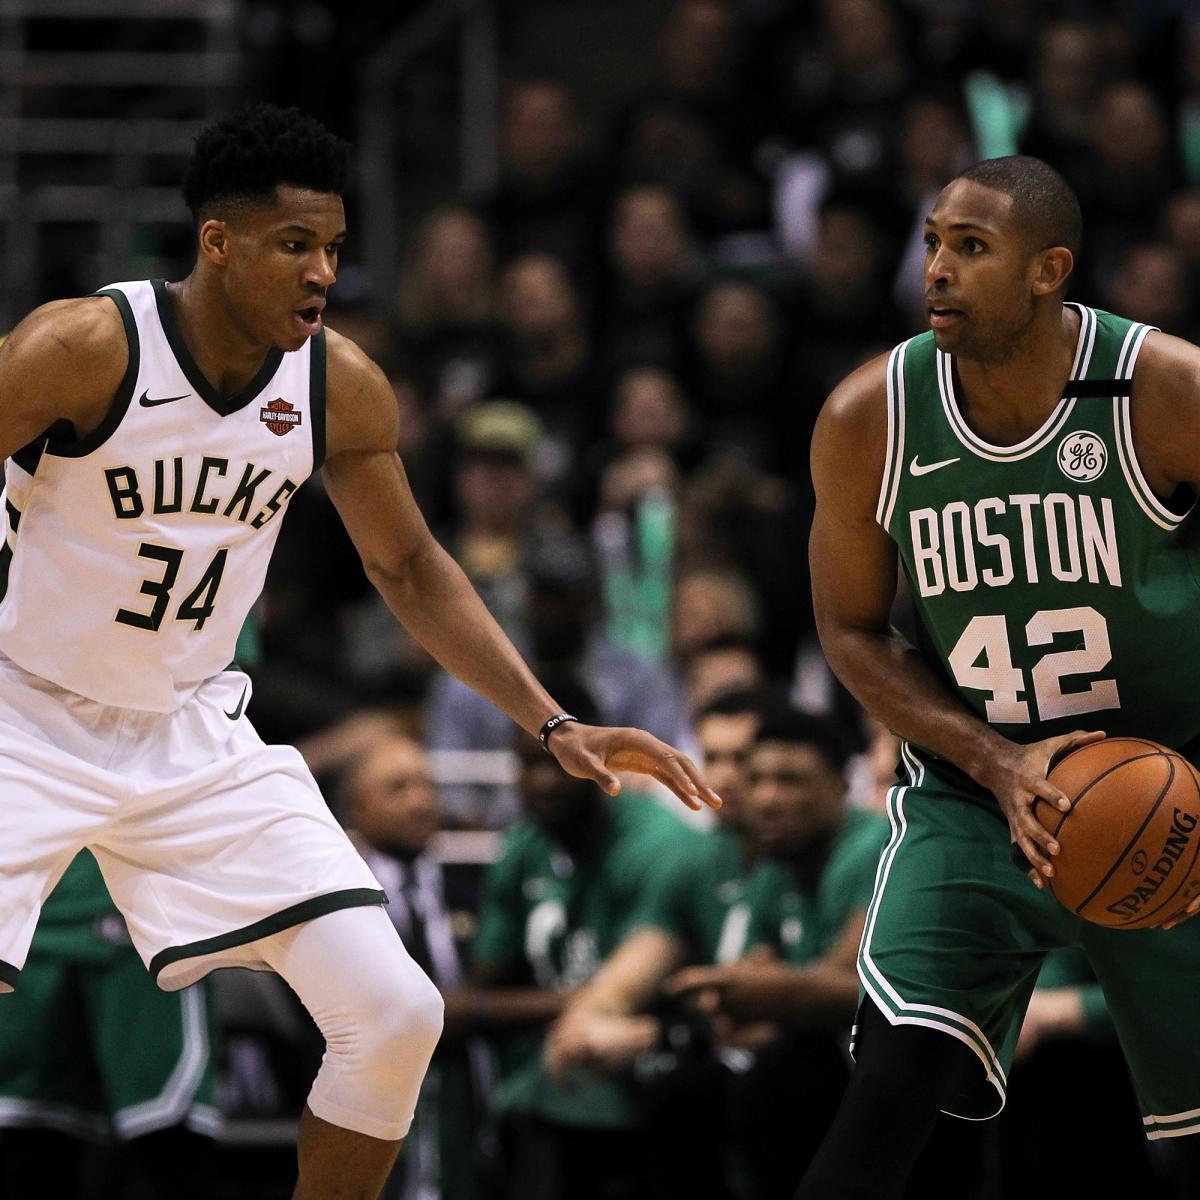 Boston Vs Warriors Live Stream Free: NBA Playoff Bracket 2018: TV Schedule, Saturday Live